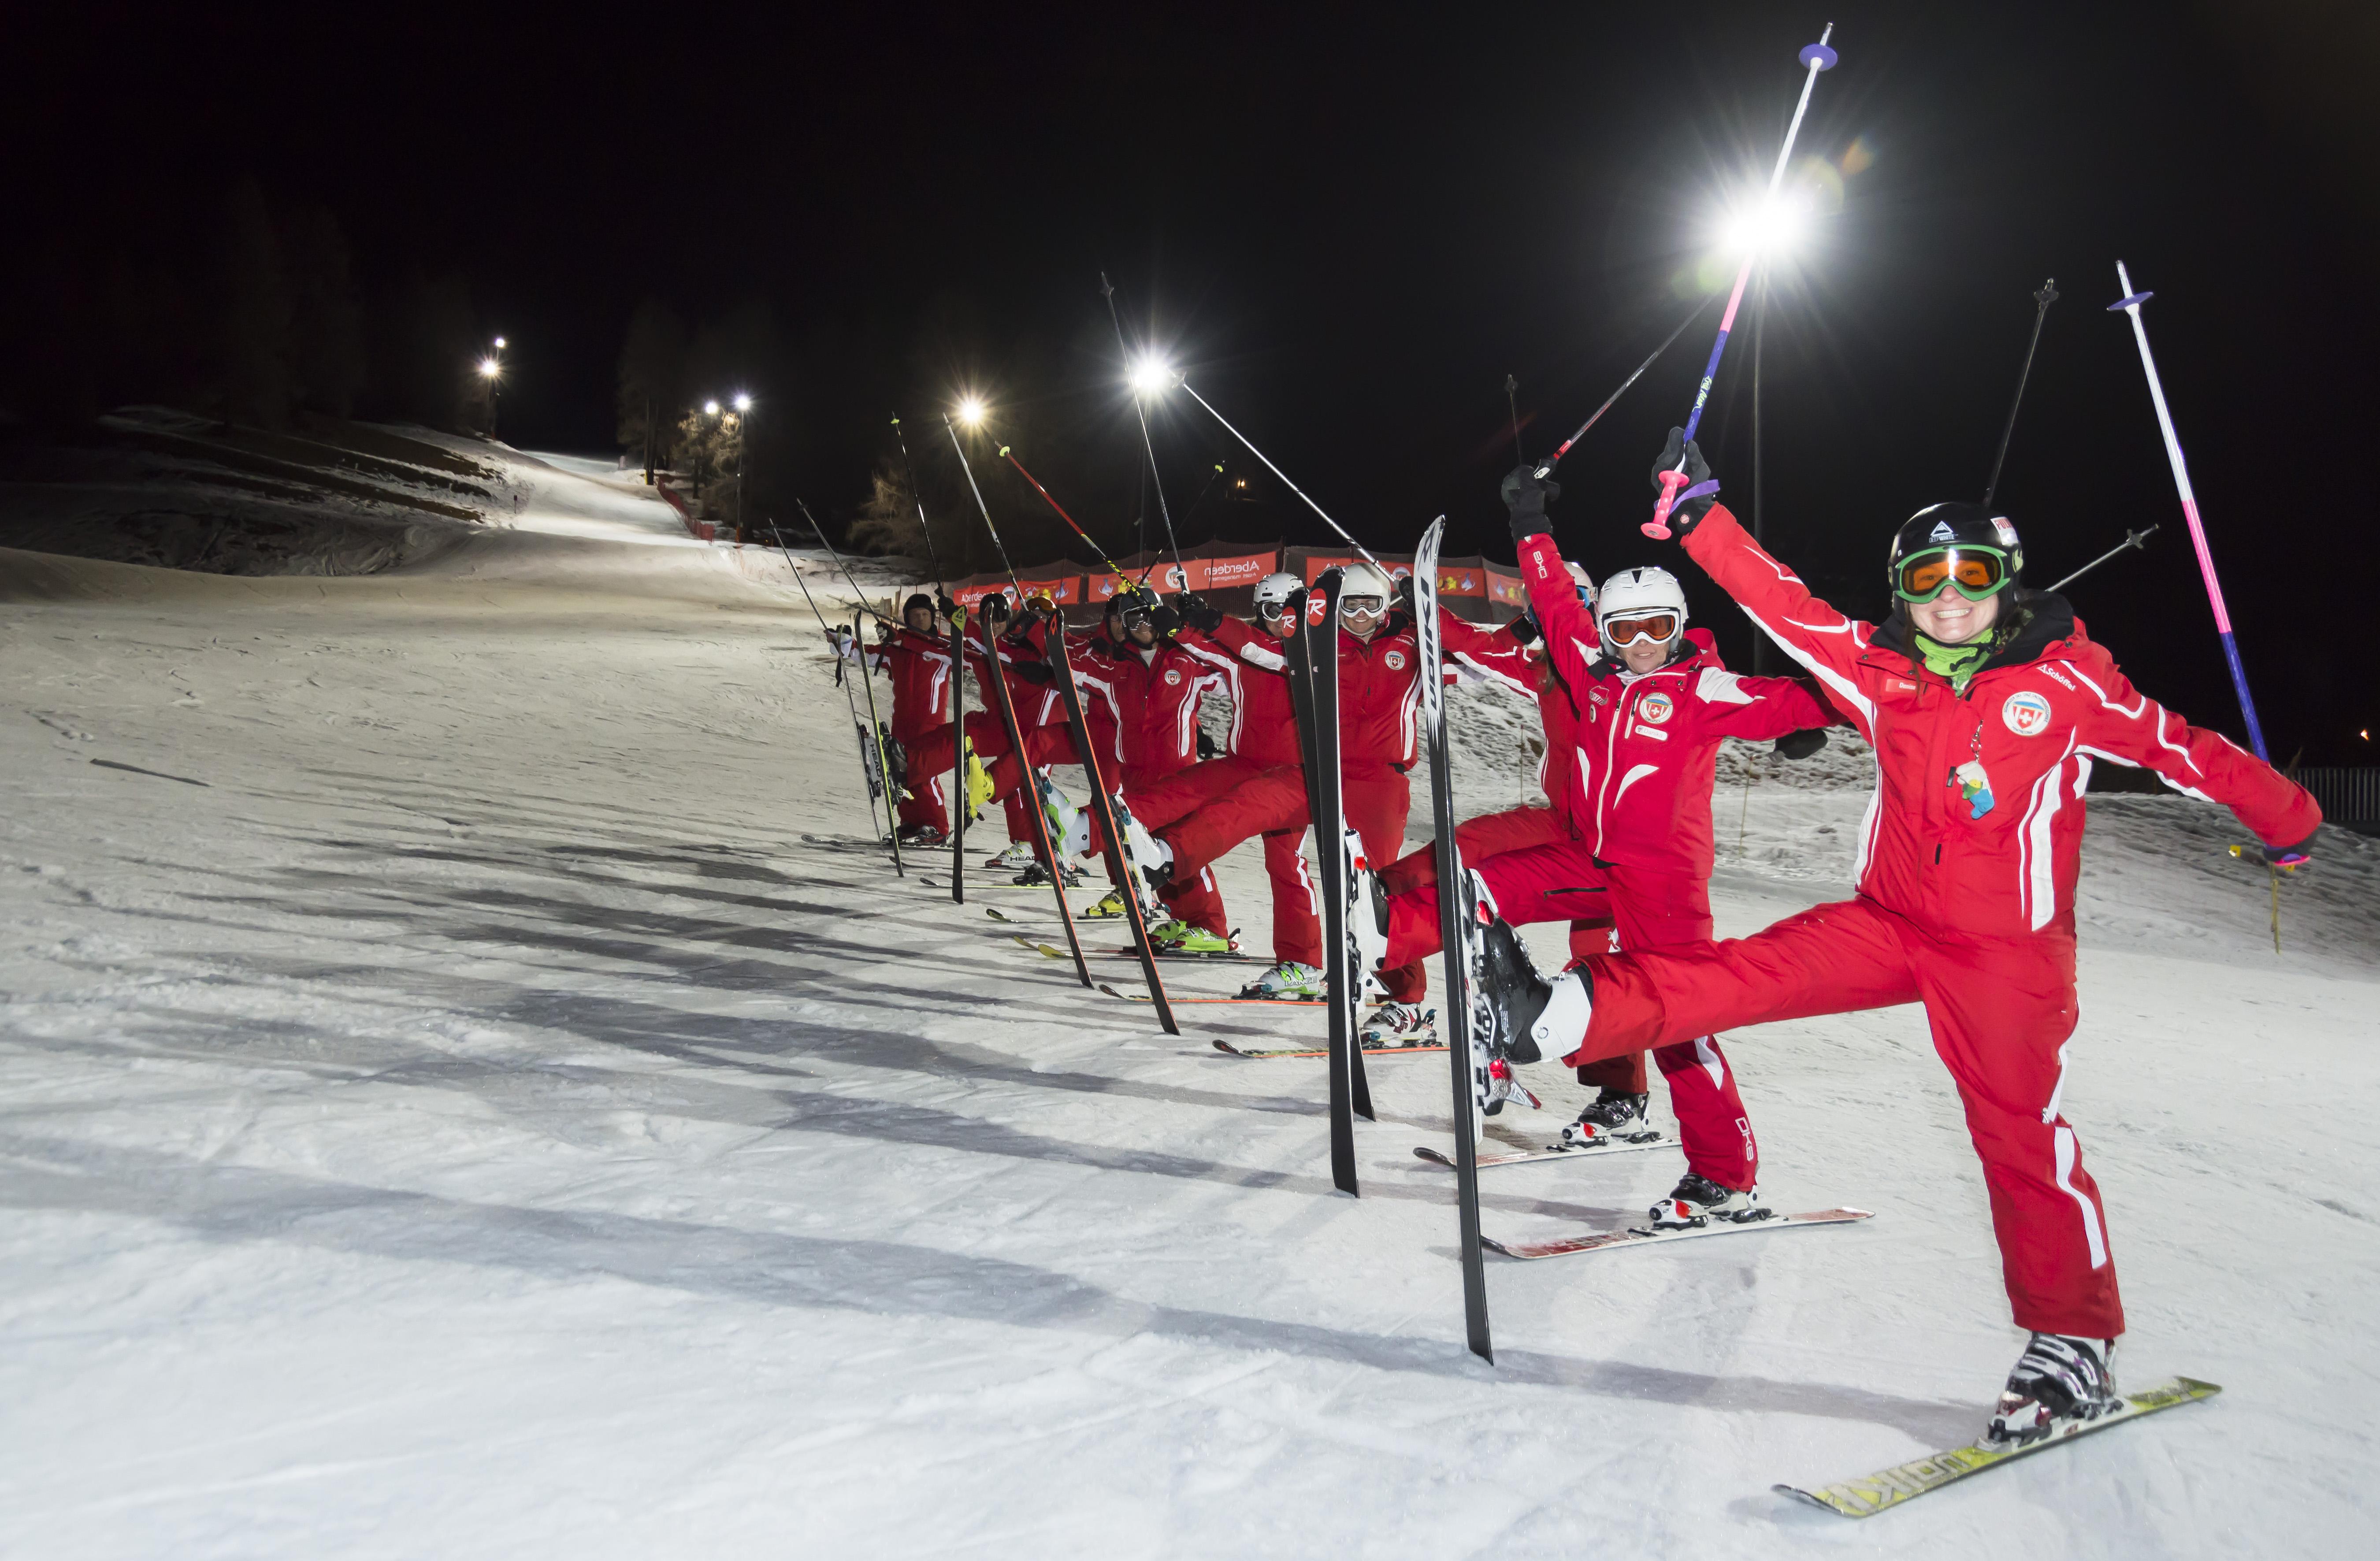 Schweizer Skischule Corvatsch-Pontresina AG Slide 1